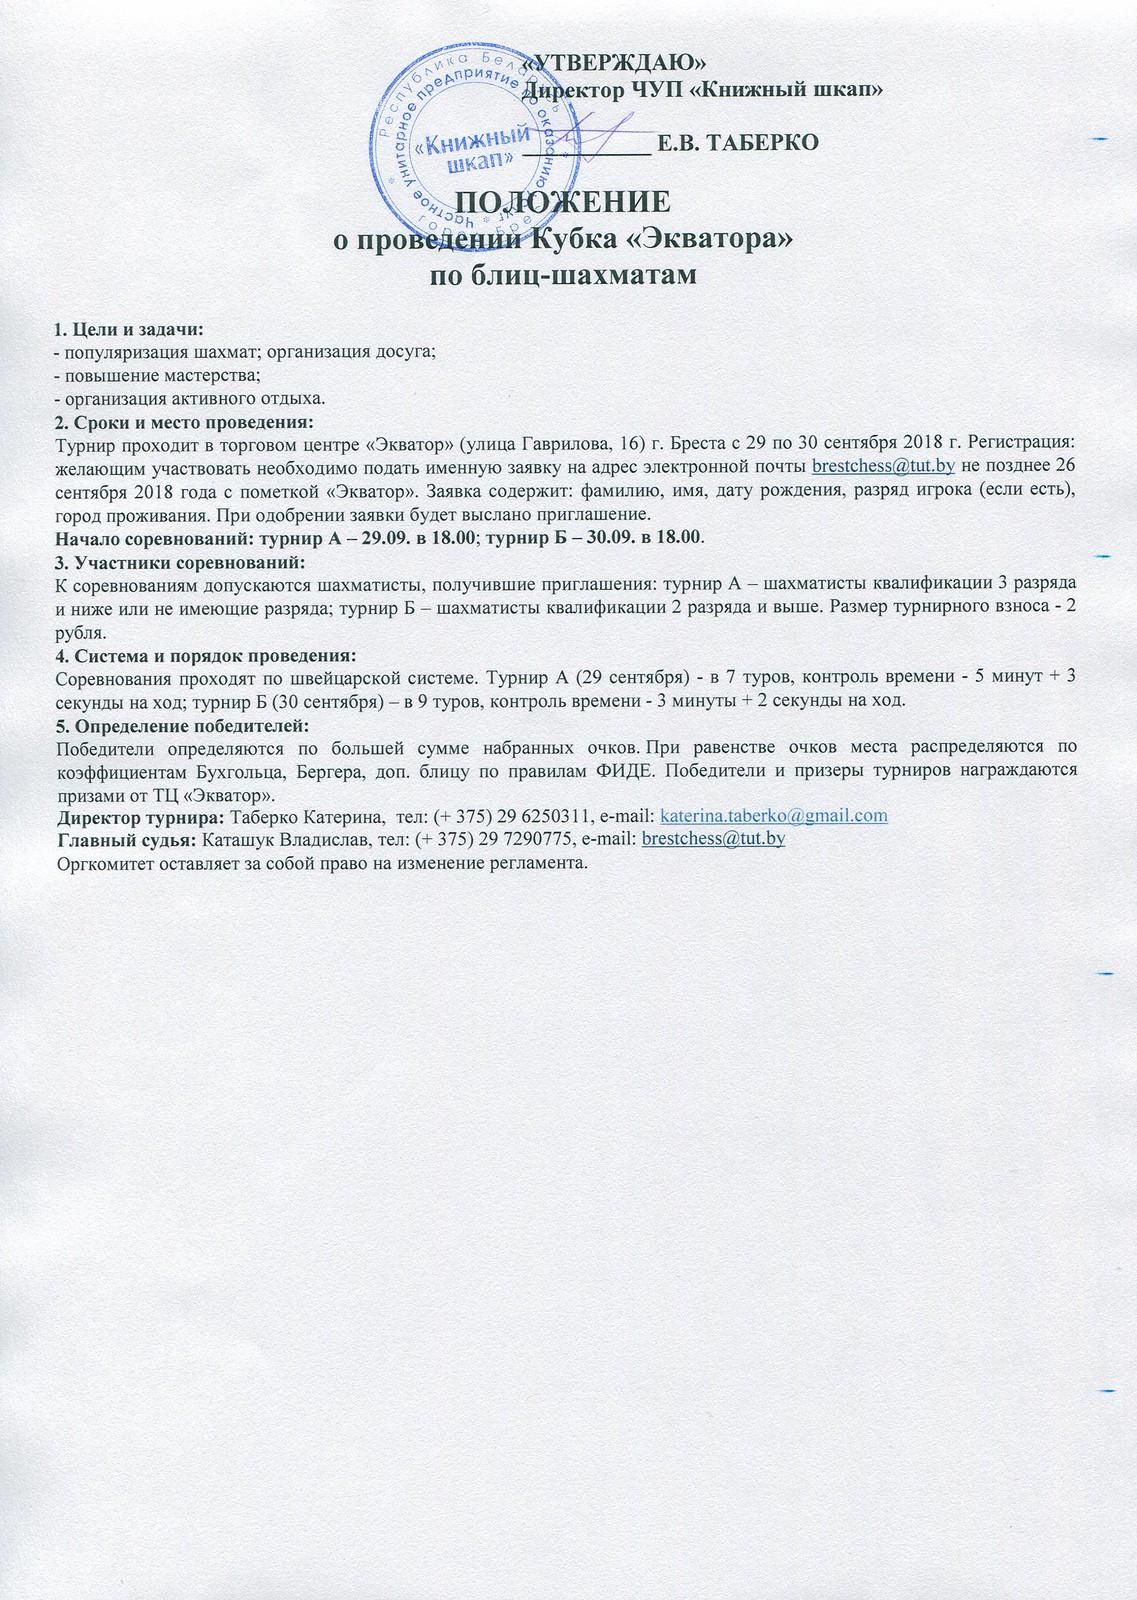 img522